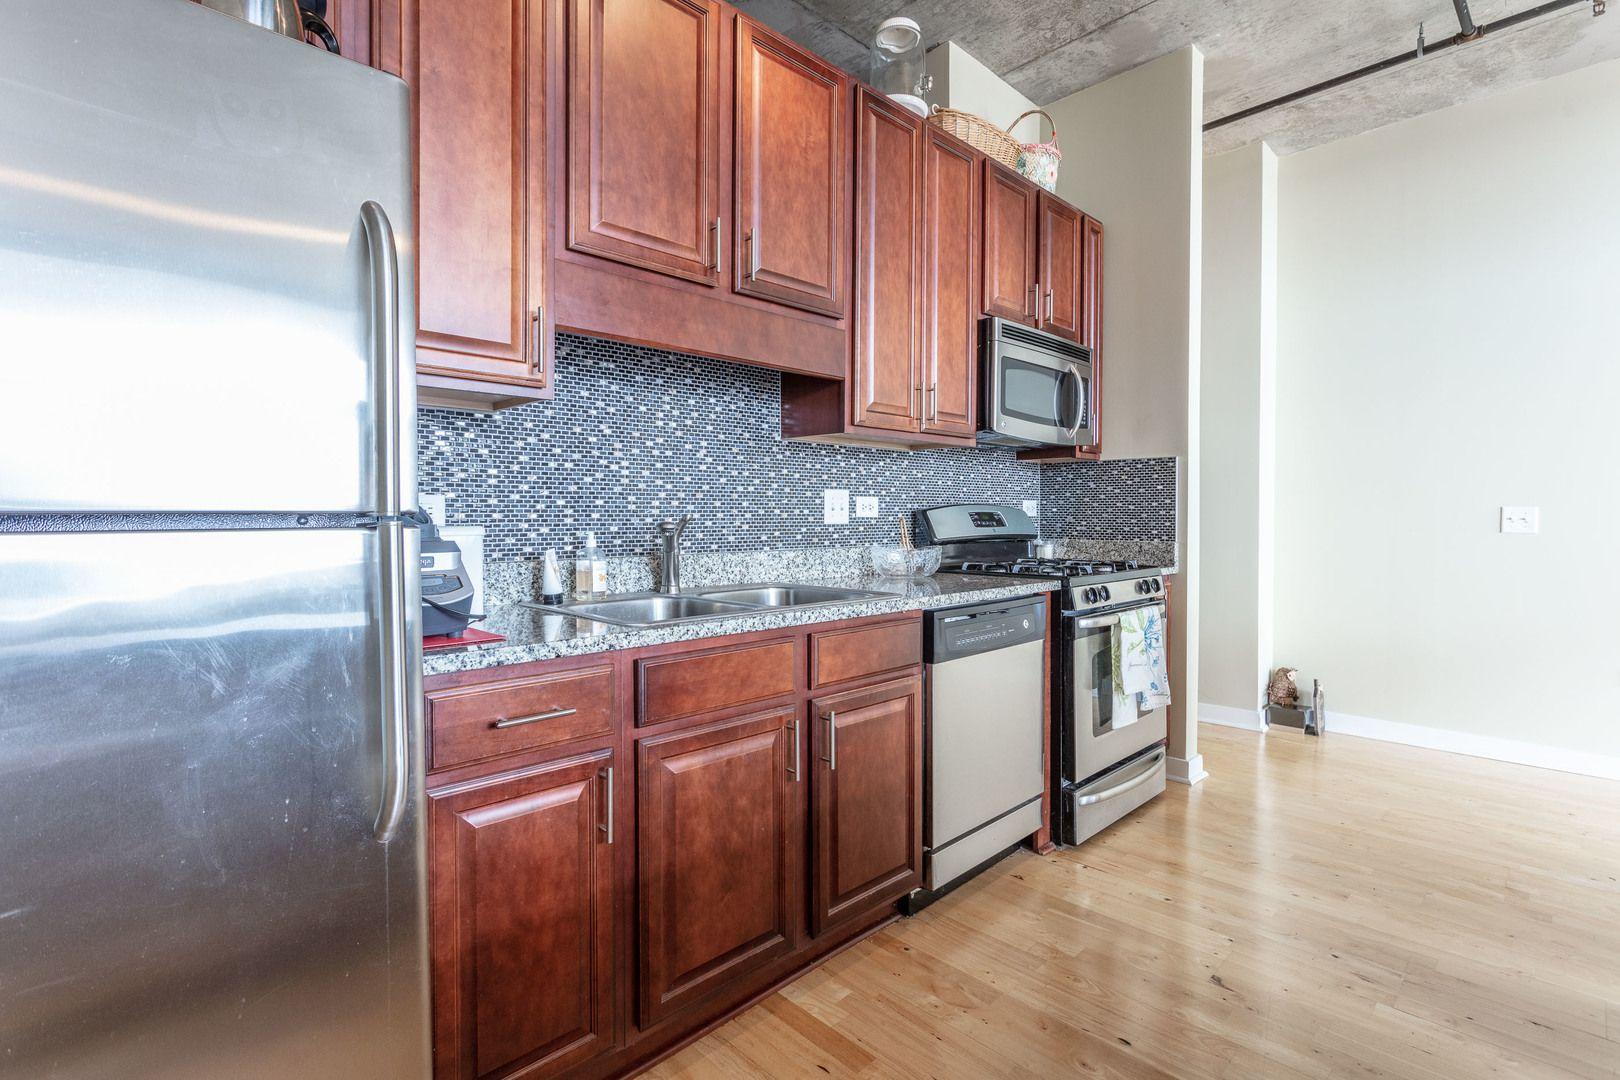 Chicago Condos Near South Side 1 Bedroom Condo for Rent